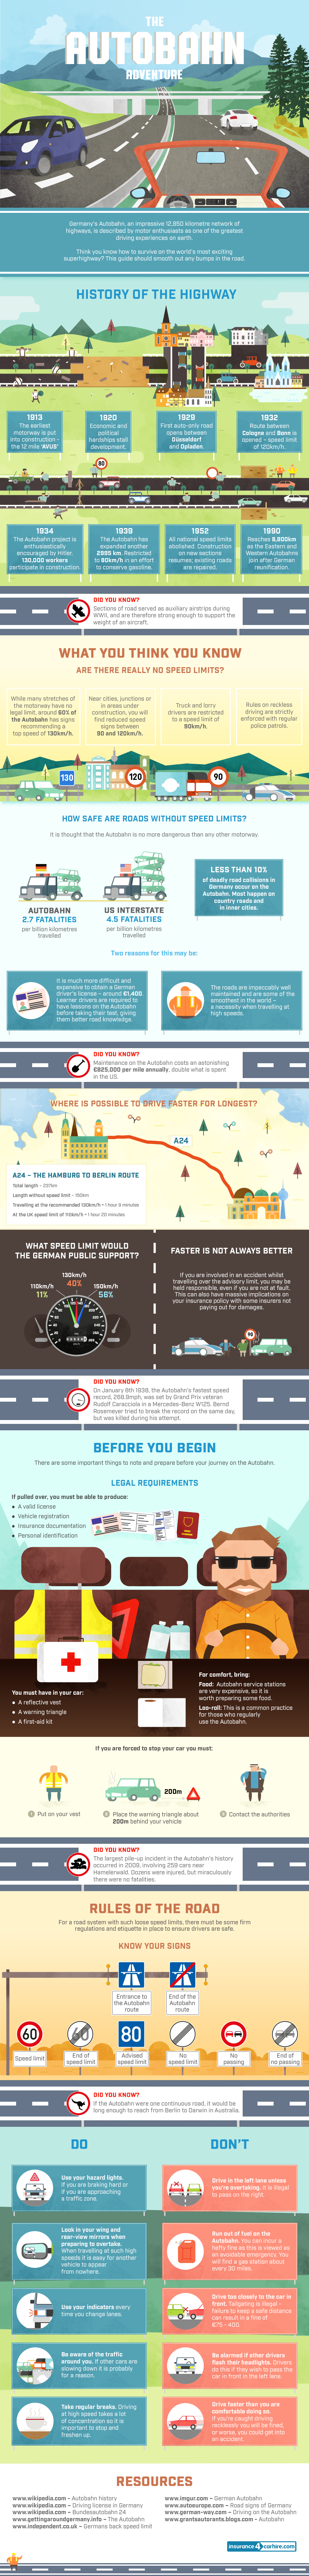 The Autobahn Adventure